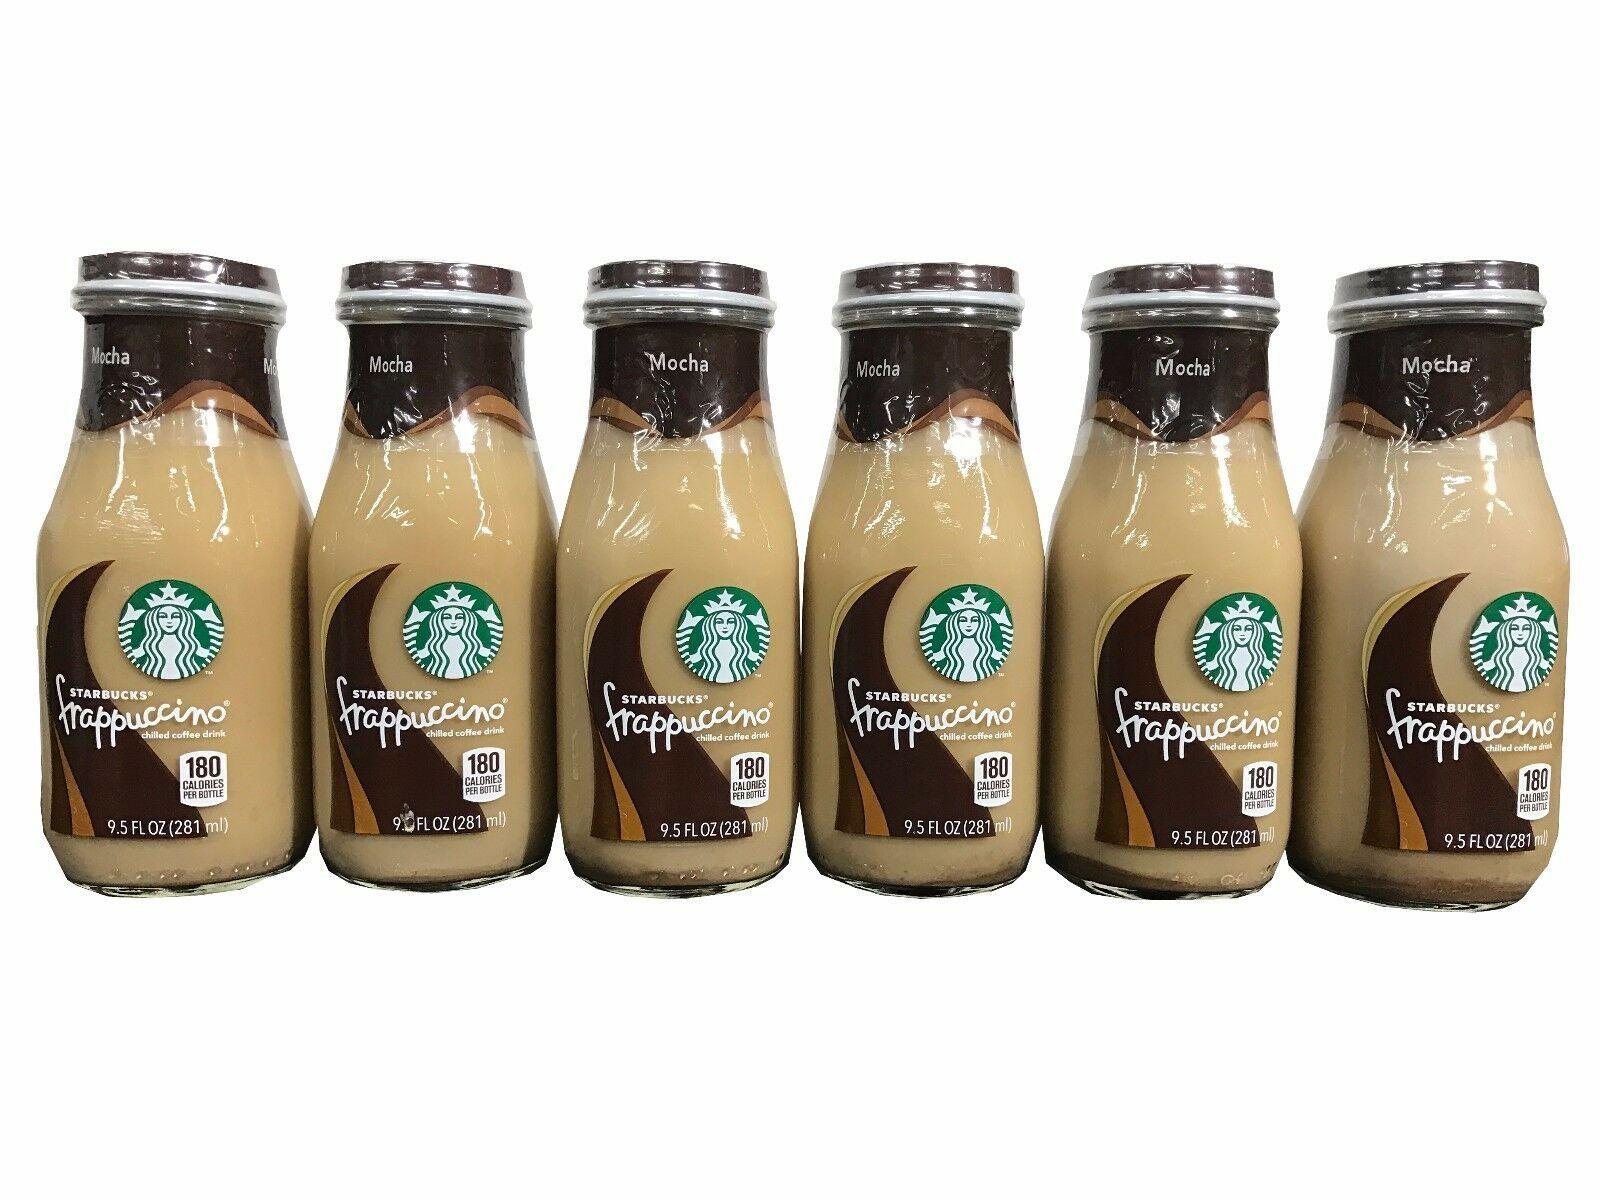 Details about Starbucks Mocha Frappuccino 9.5 fl oz